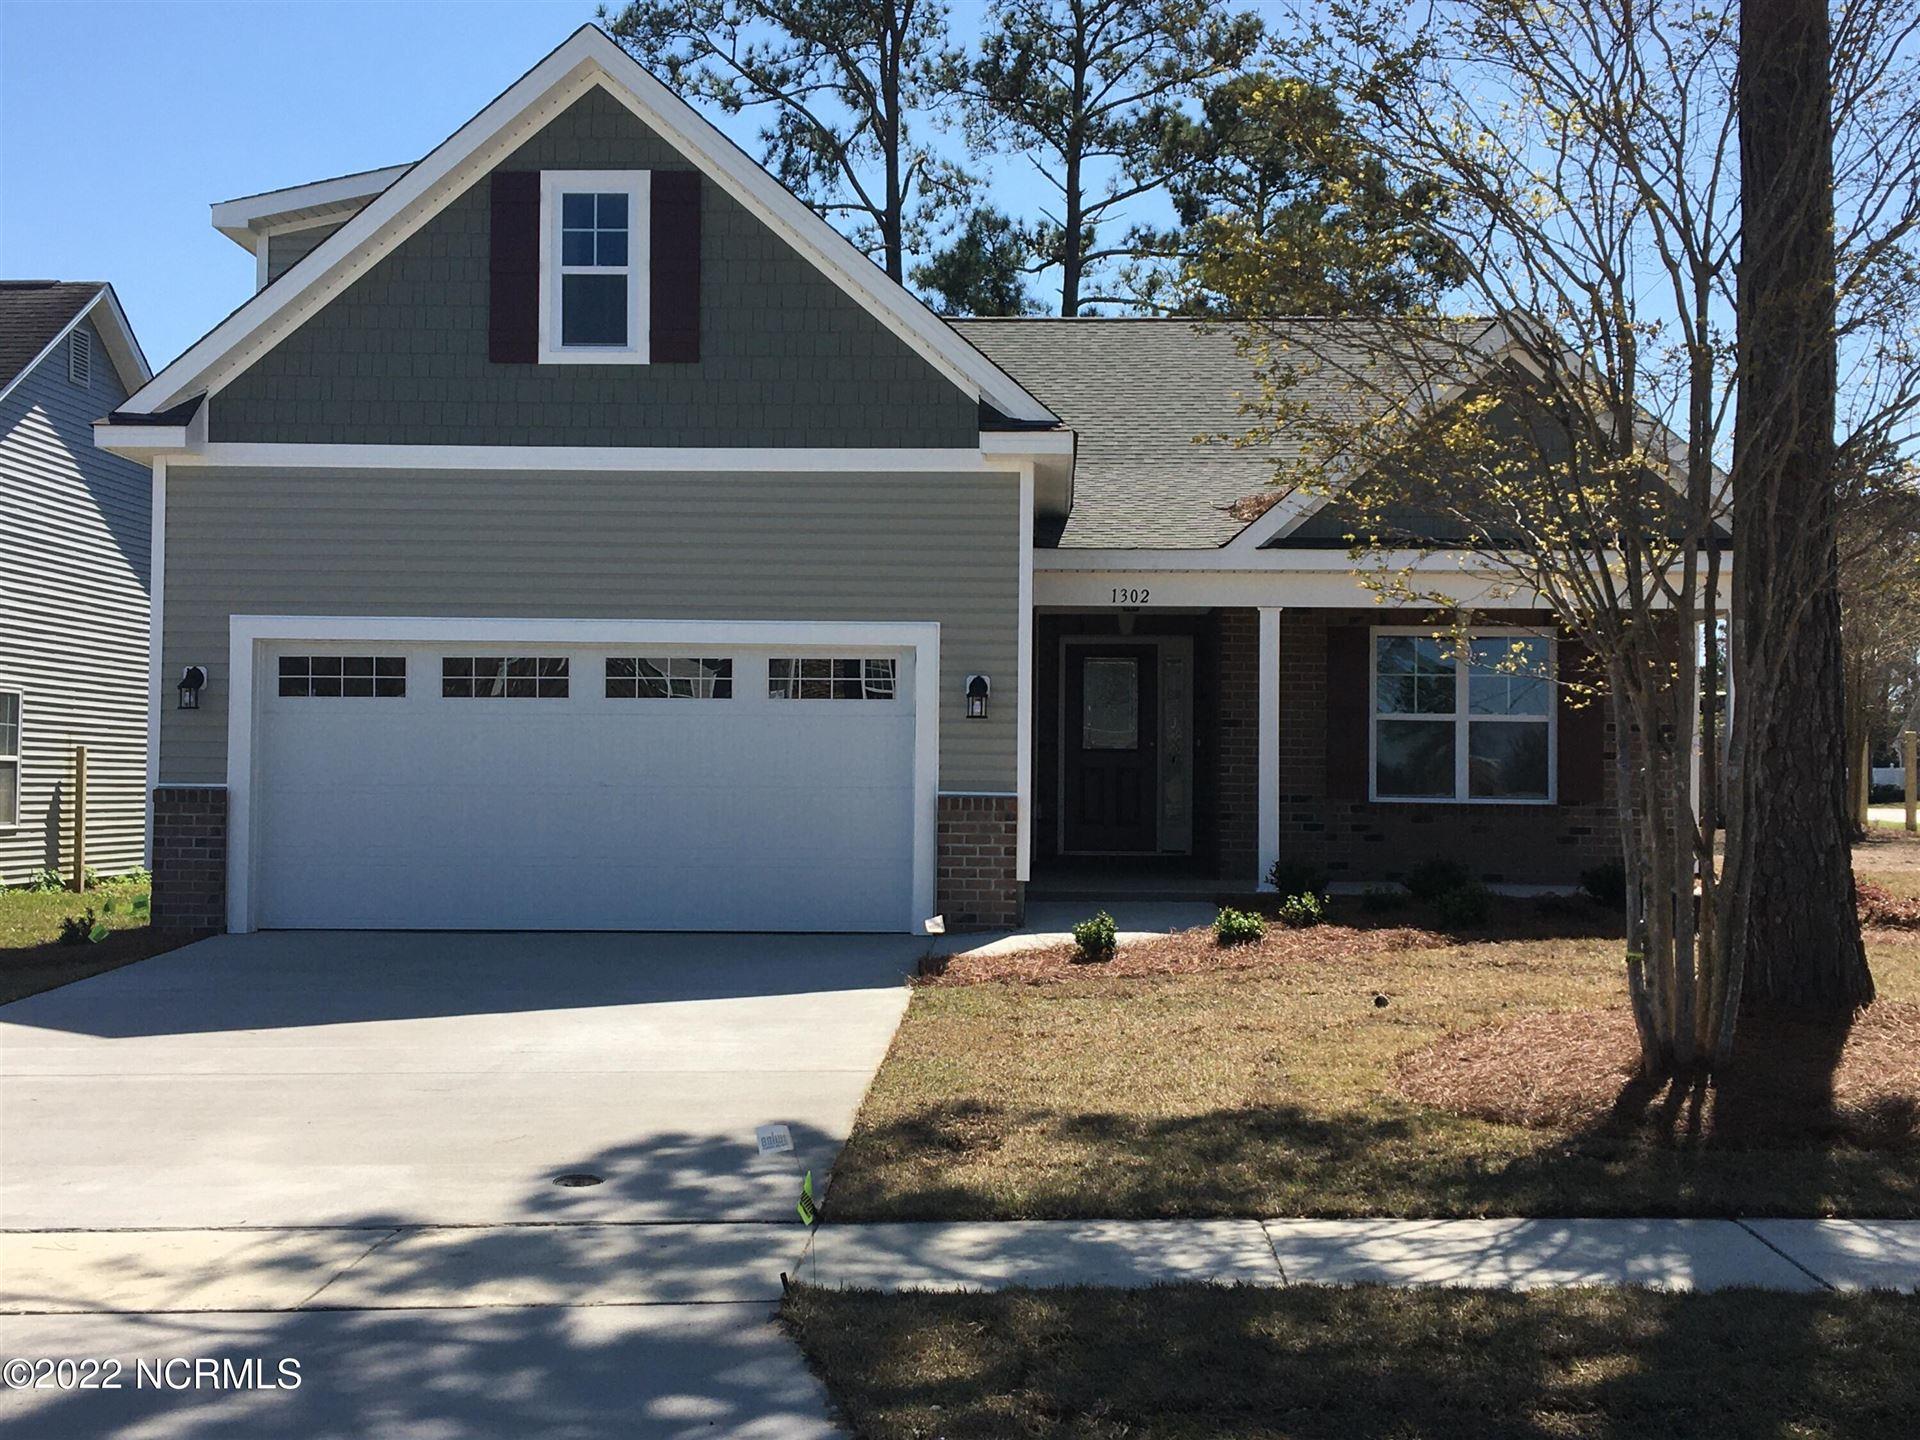 Photo of 1302 Windsor Pines Court, Leland, NC 28451 (MLS # 100294667)